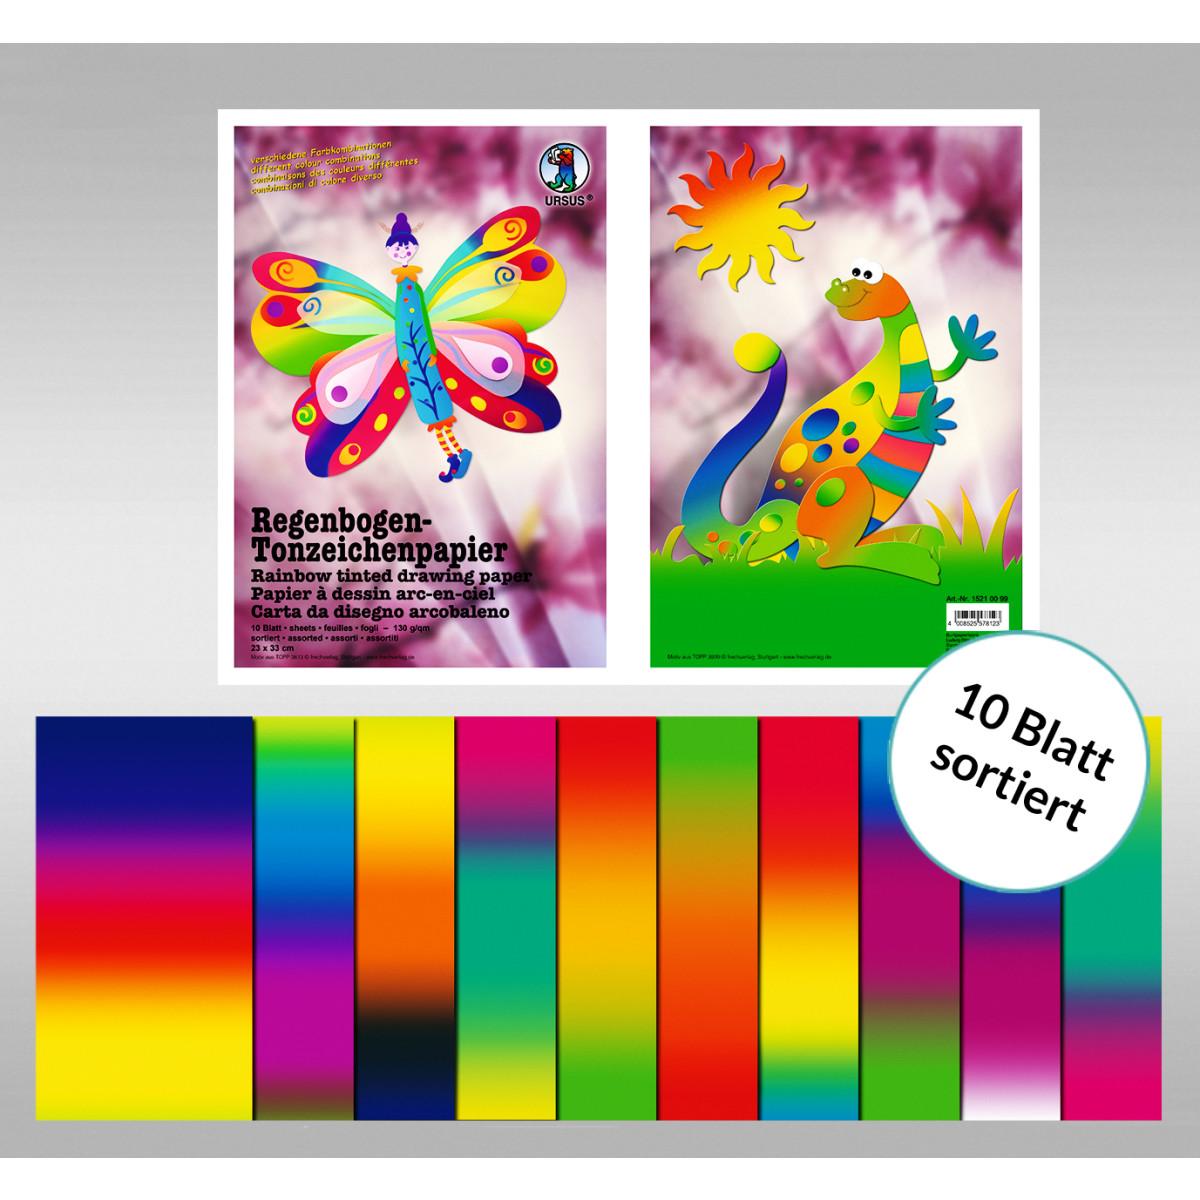 Regenbogen-Tonzeichenpapier 130 g/qm 23 x 33 cm - 10 Blatt sortiert